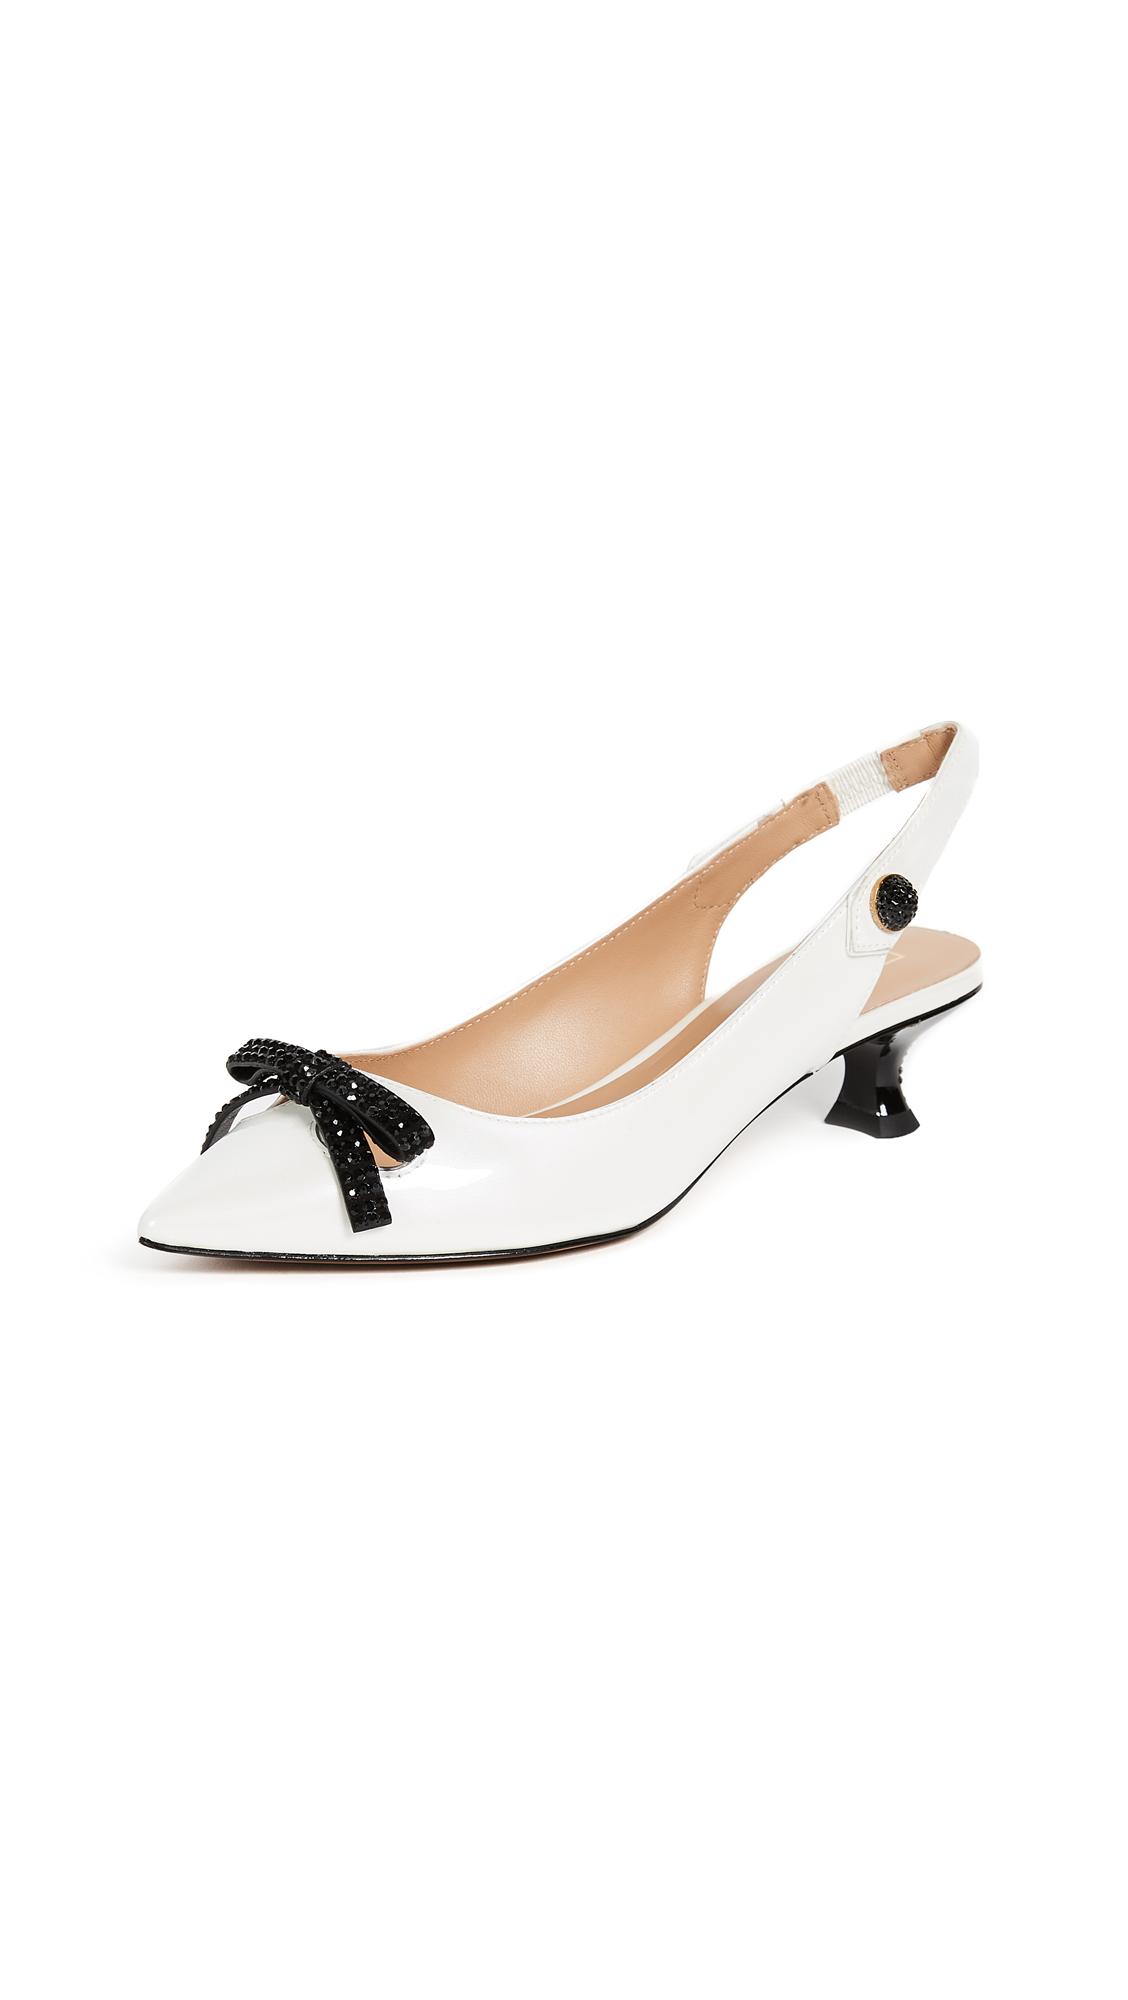 Marc Jacobs Abbey Slingback Pumps - White